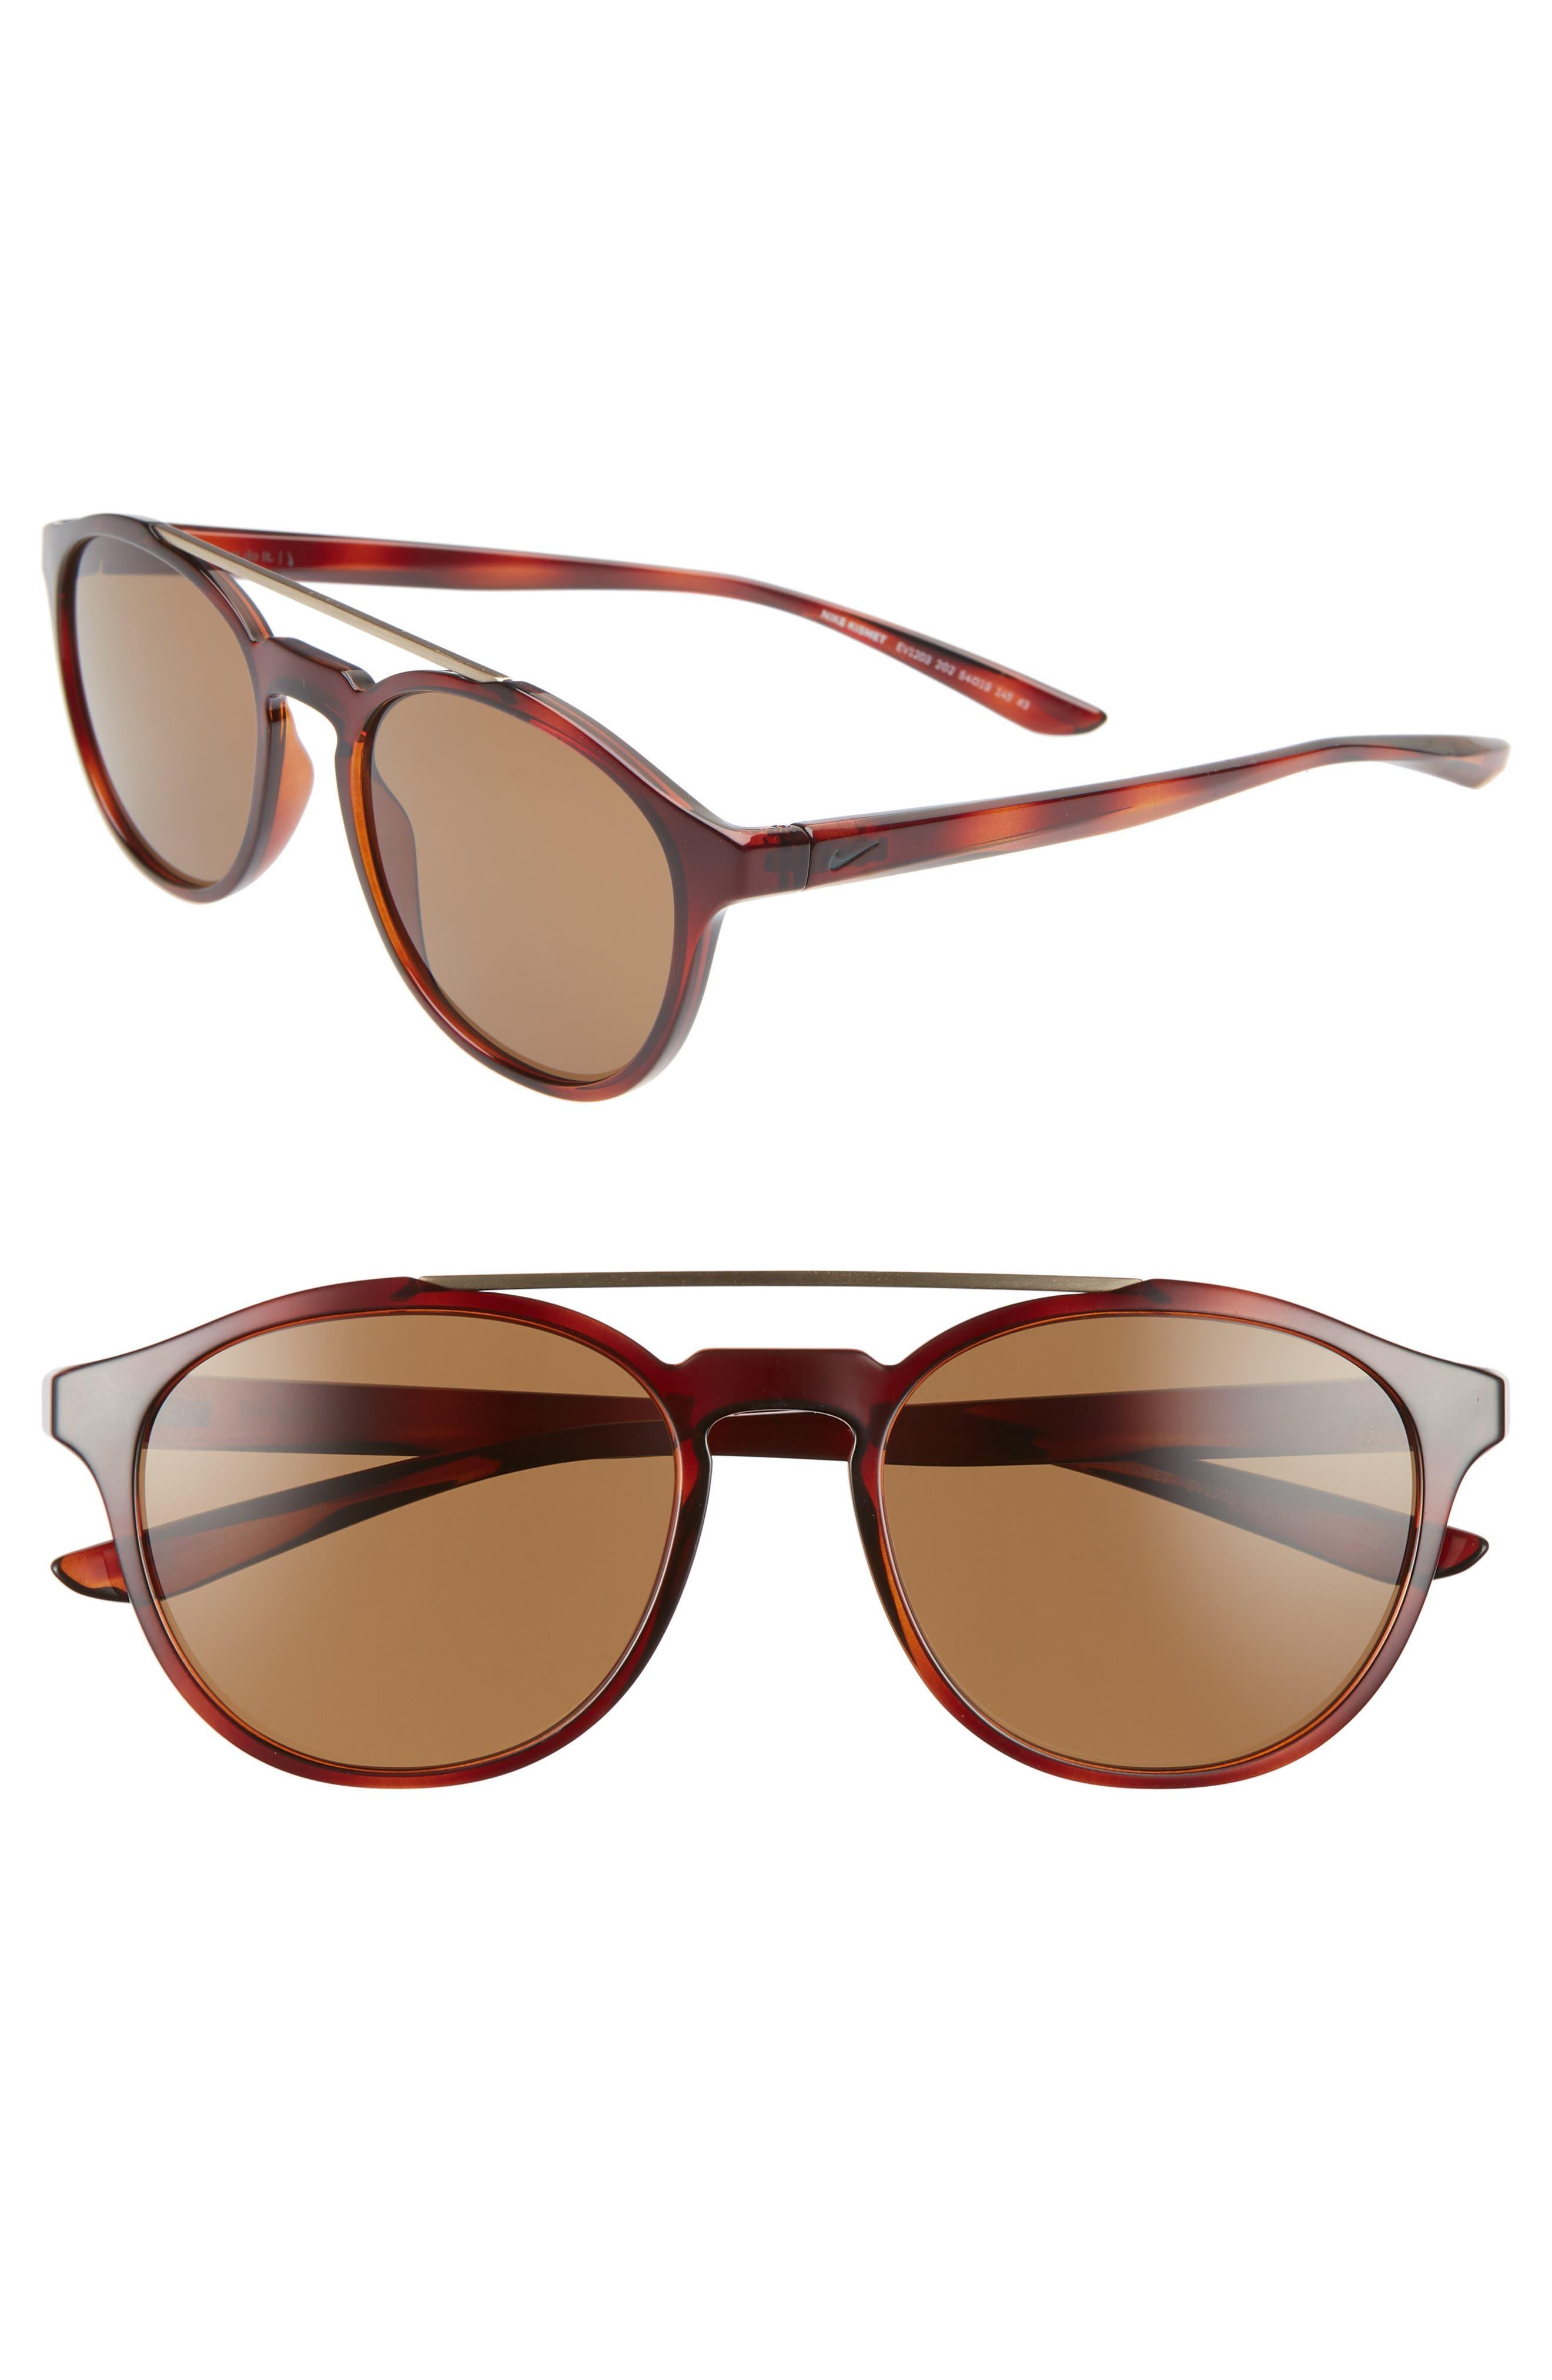 Nike Kismet 5m Round Sunglasses - Tortoise/ Brown